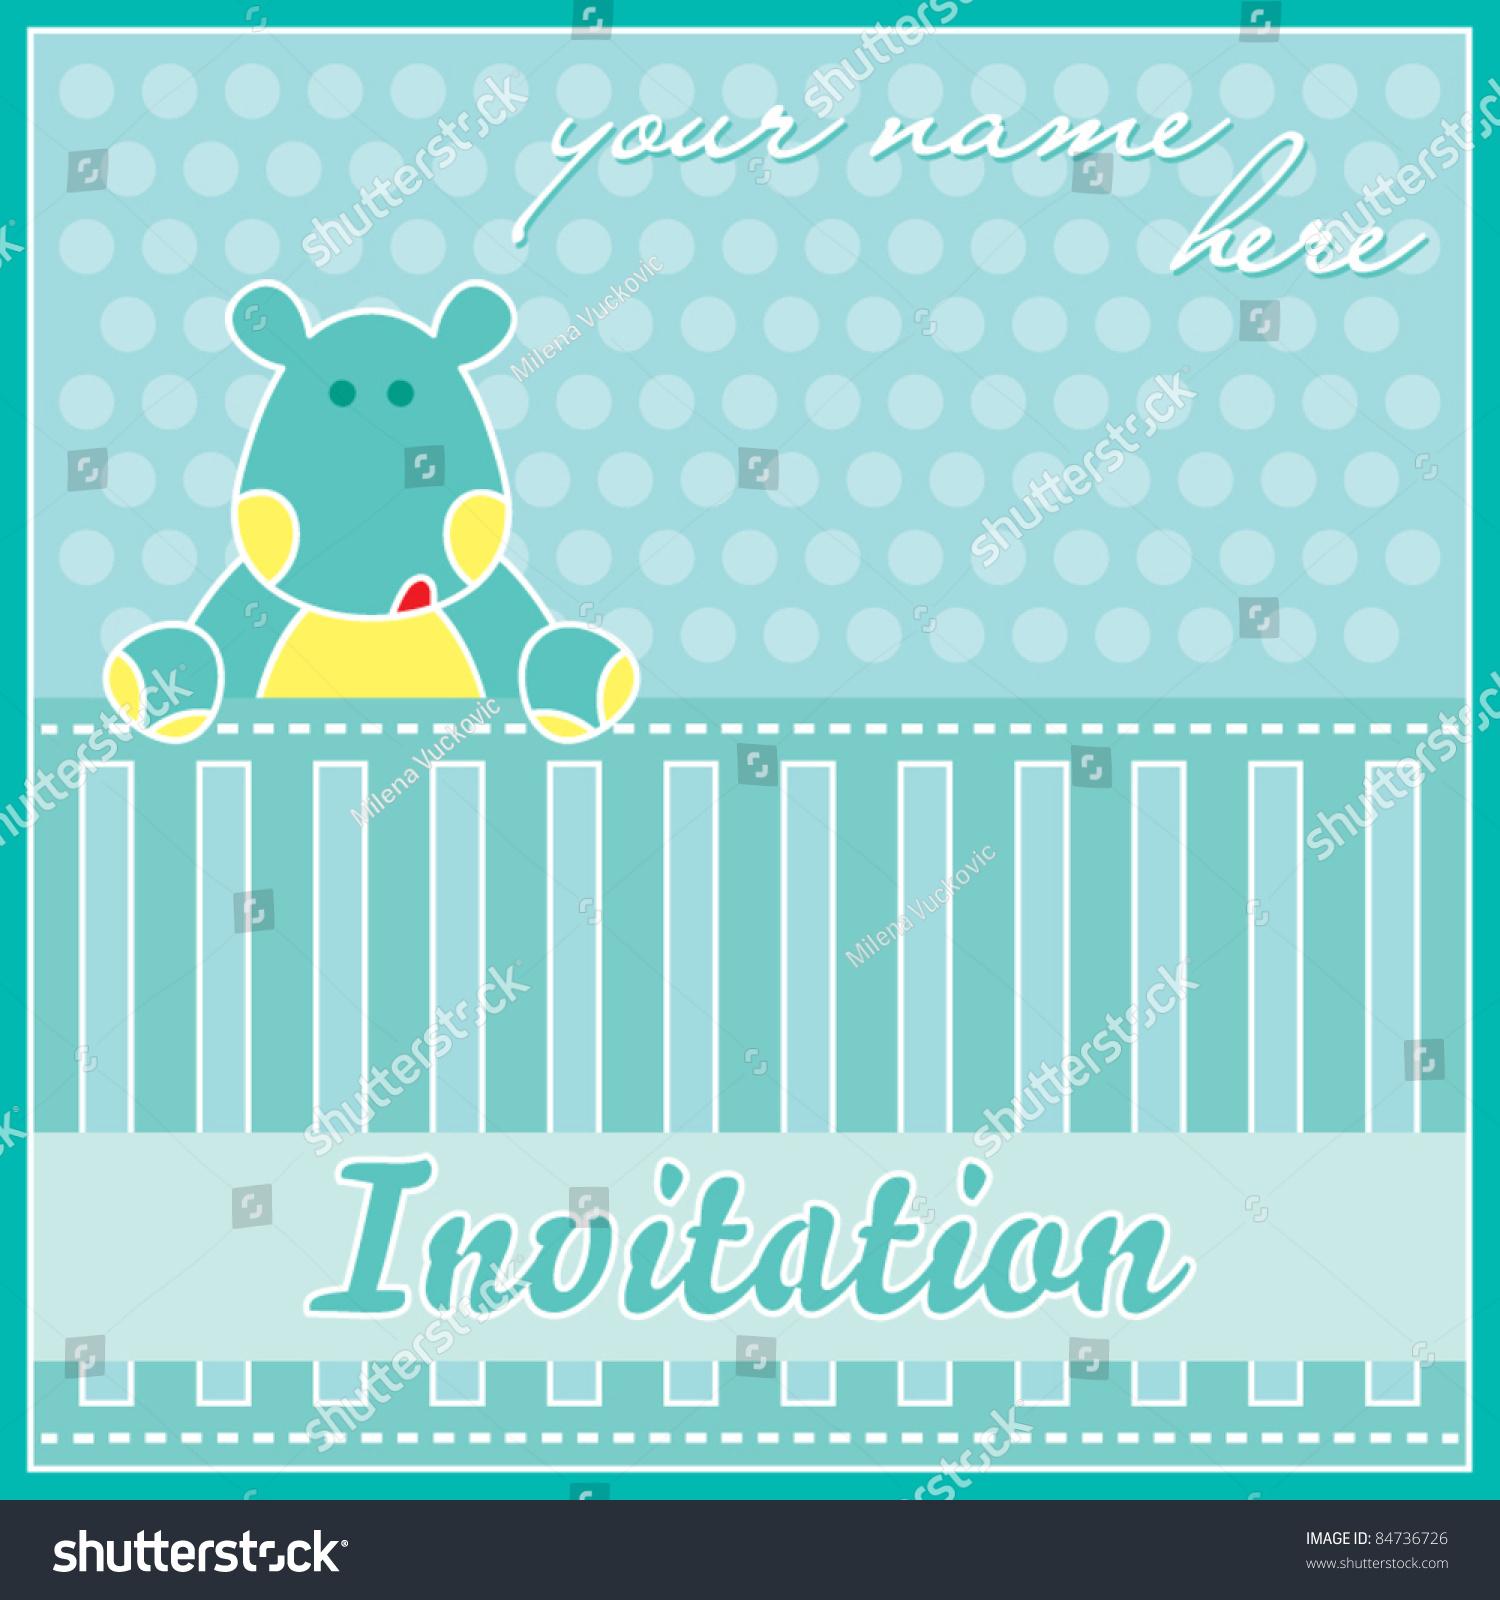 Template Frame Design Birthday Party Invitation Stock Vector ...